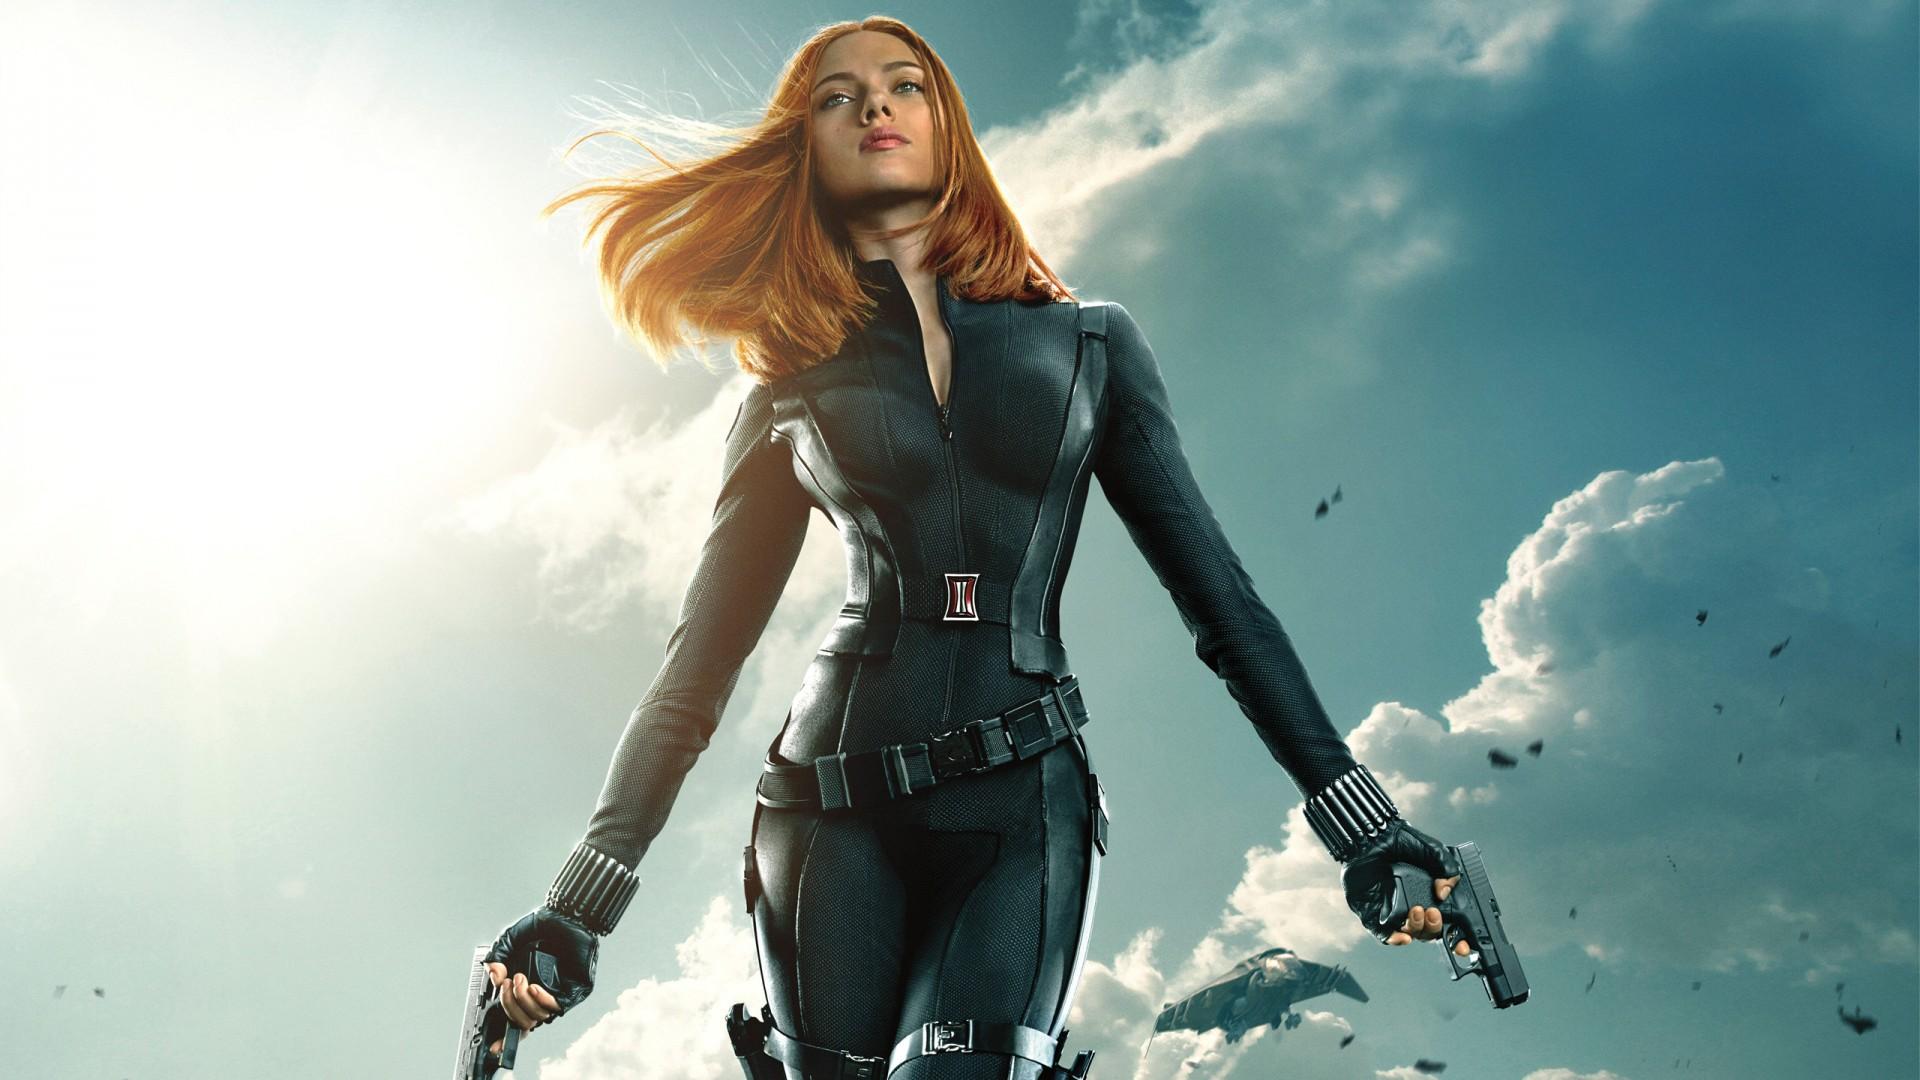 4k Wallpaper Cute League Black Widow Captain America The Winter Soldier Wallpapers